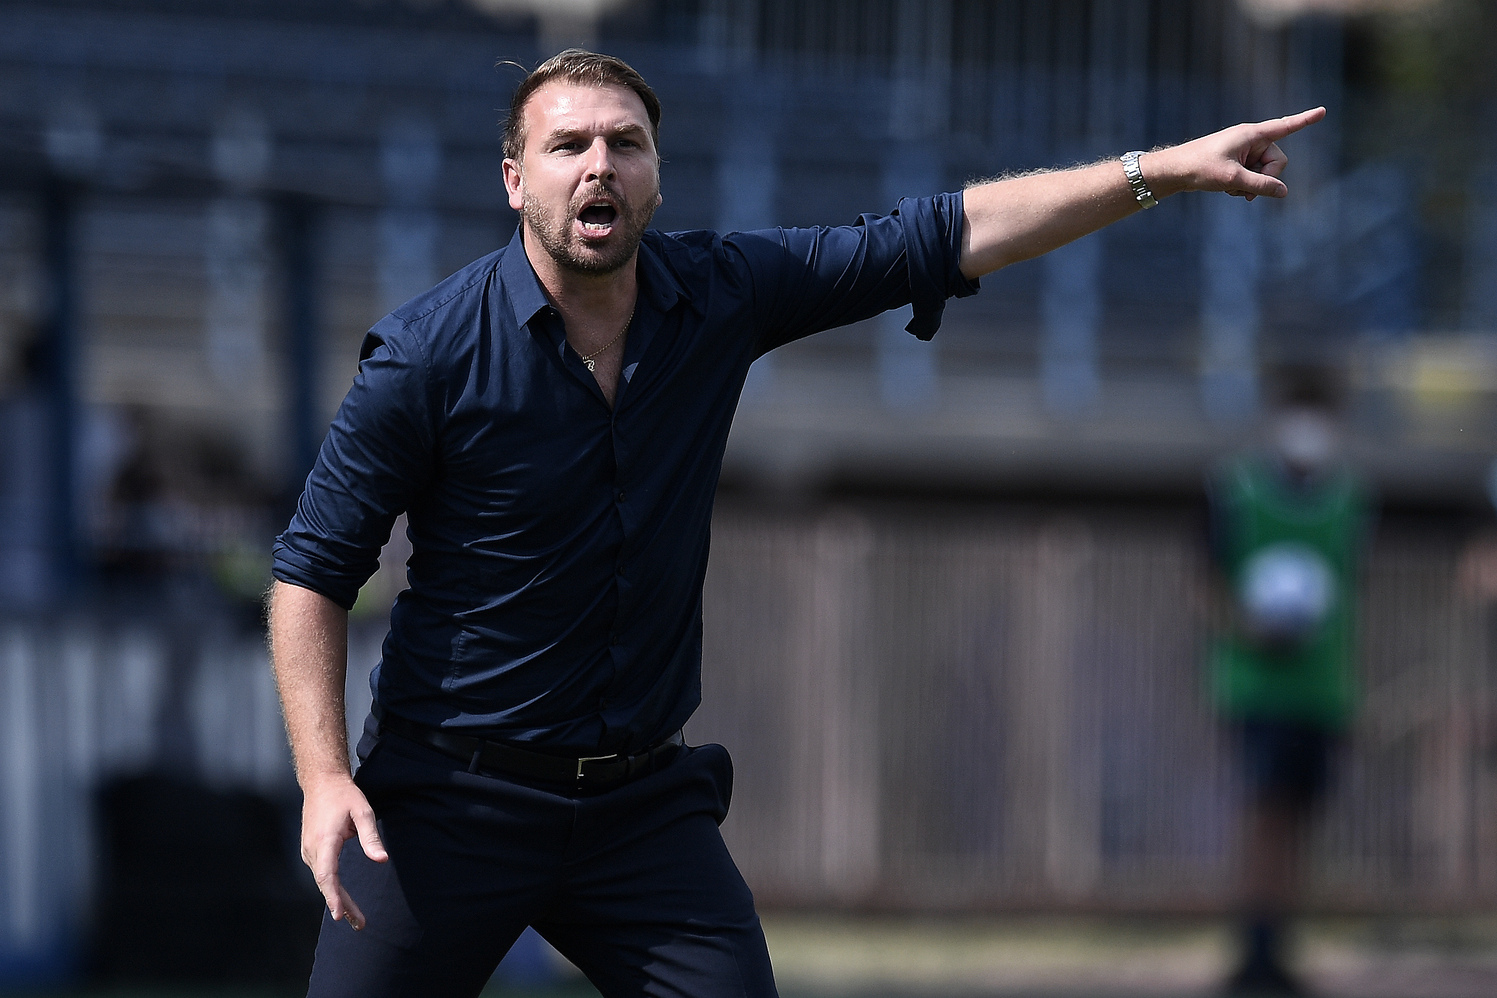 Allenatore Venezia: Ibra mi diede una gomitata in bocca |  Sport e Vai